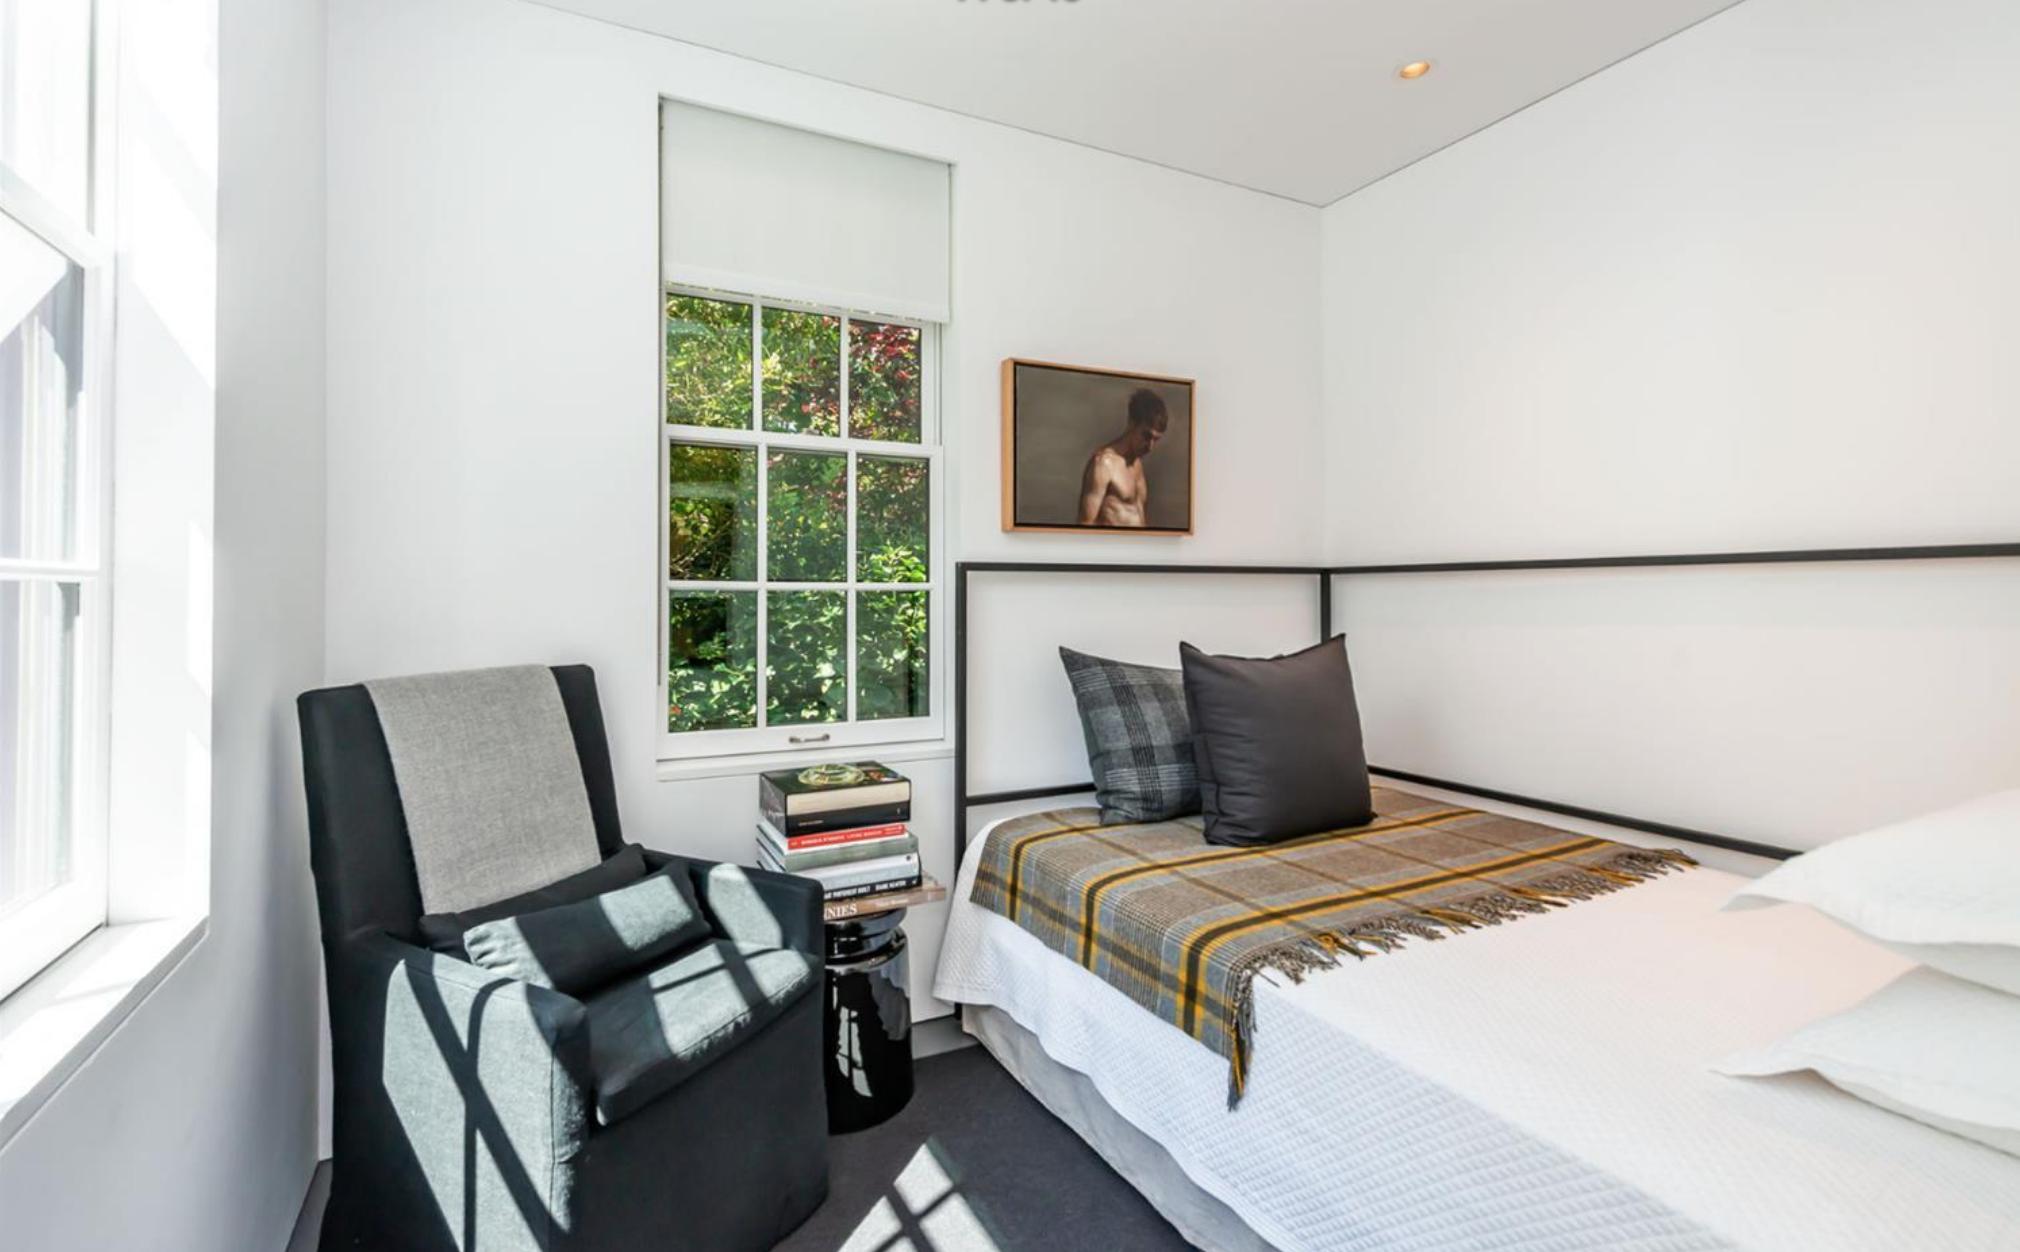 2454 1/2 Bush Street - 2nd Bedroom